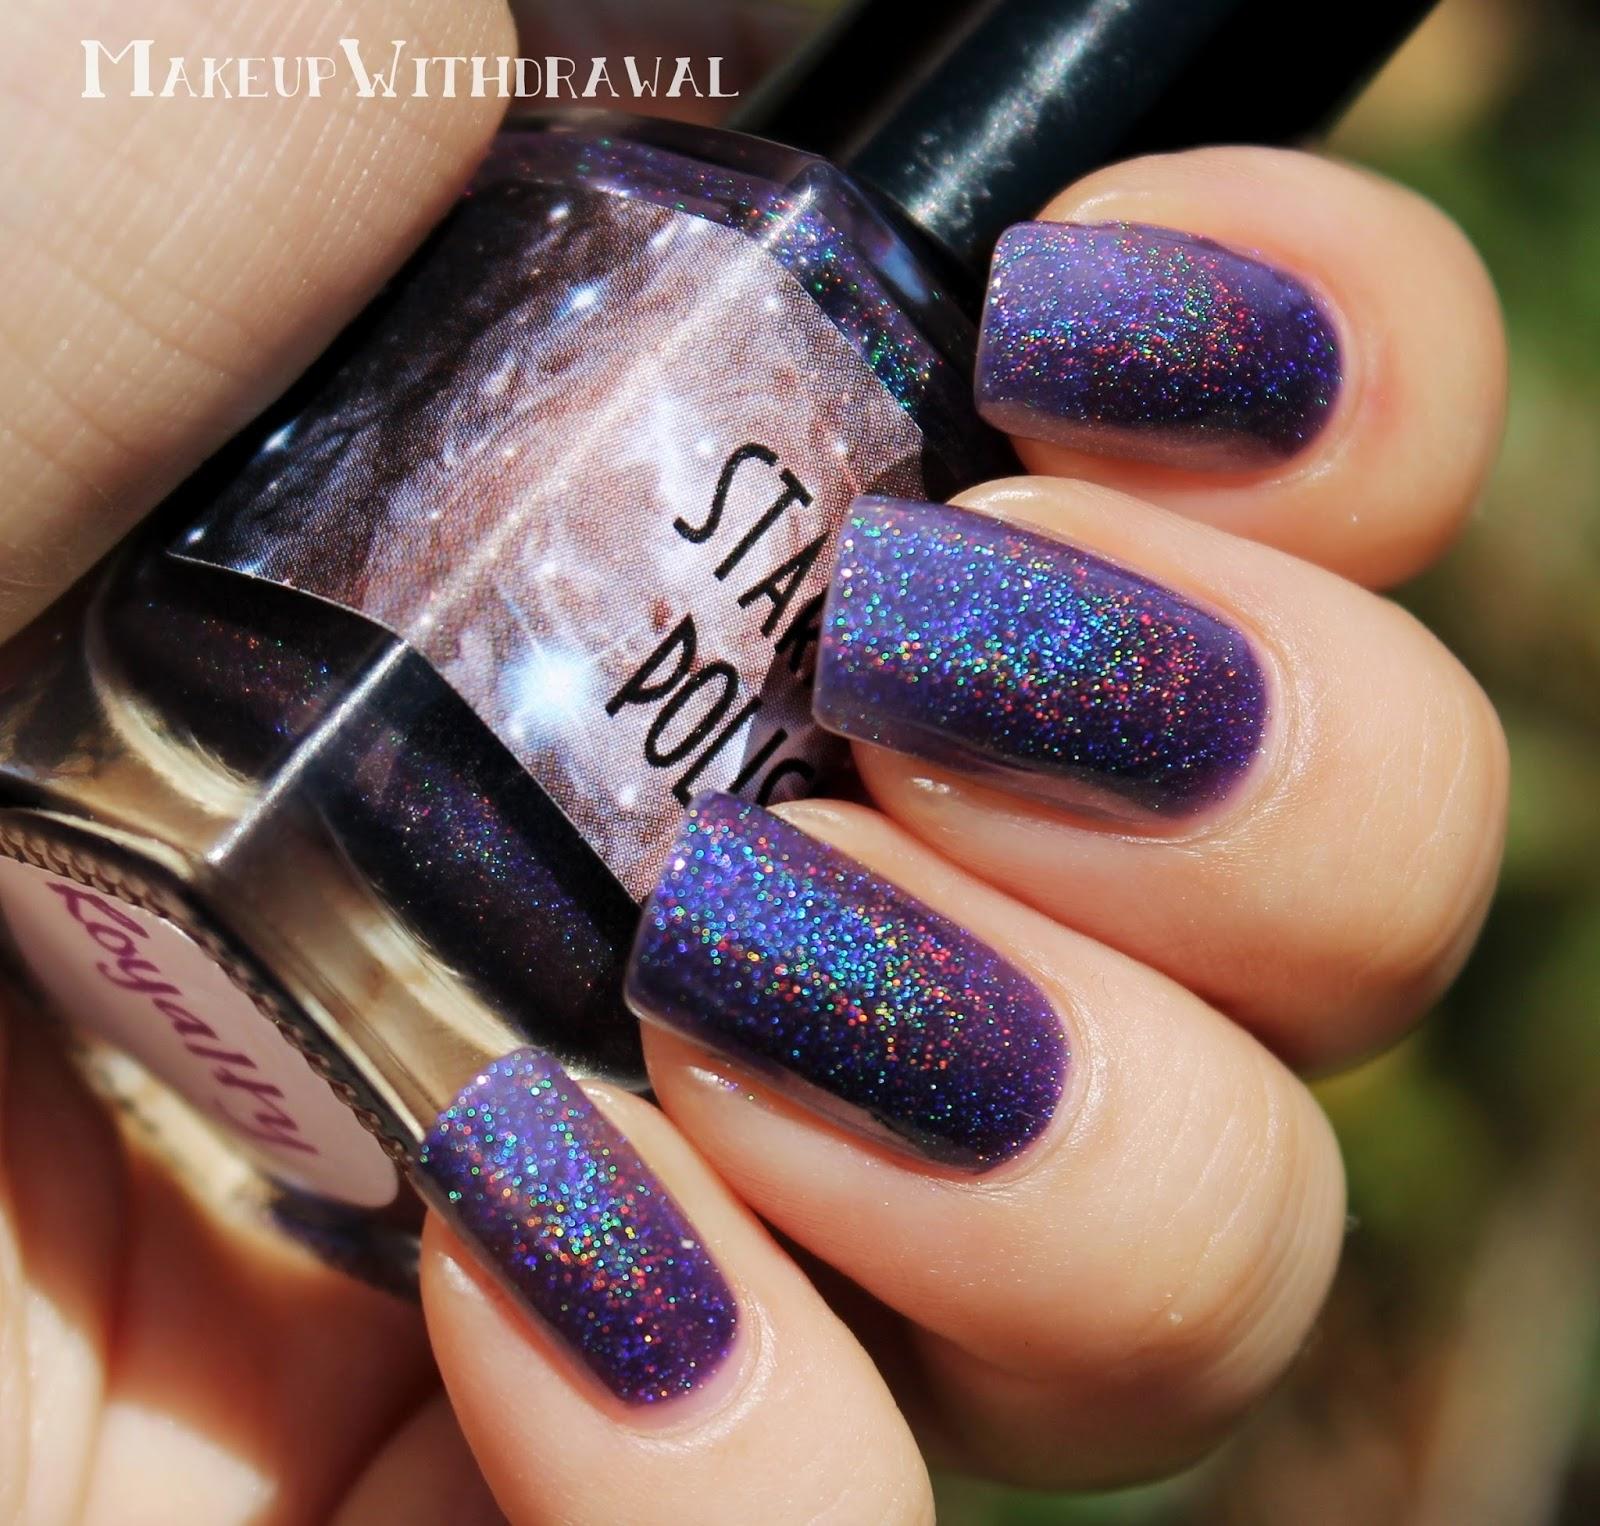 Star dust nail lacquer guerlain 25 - Stardust Polish Royalty